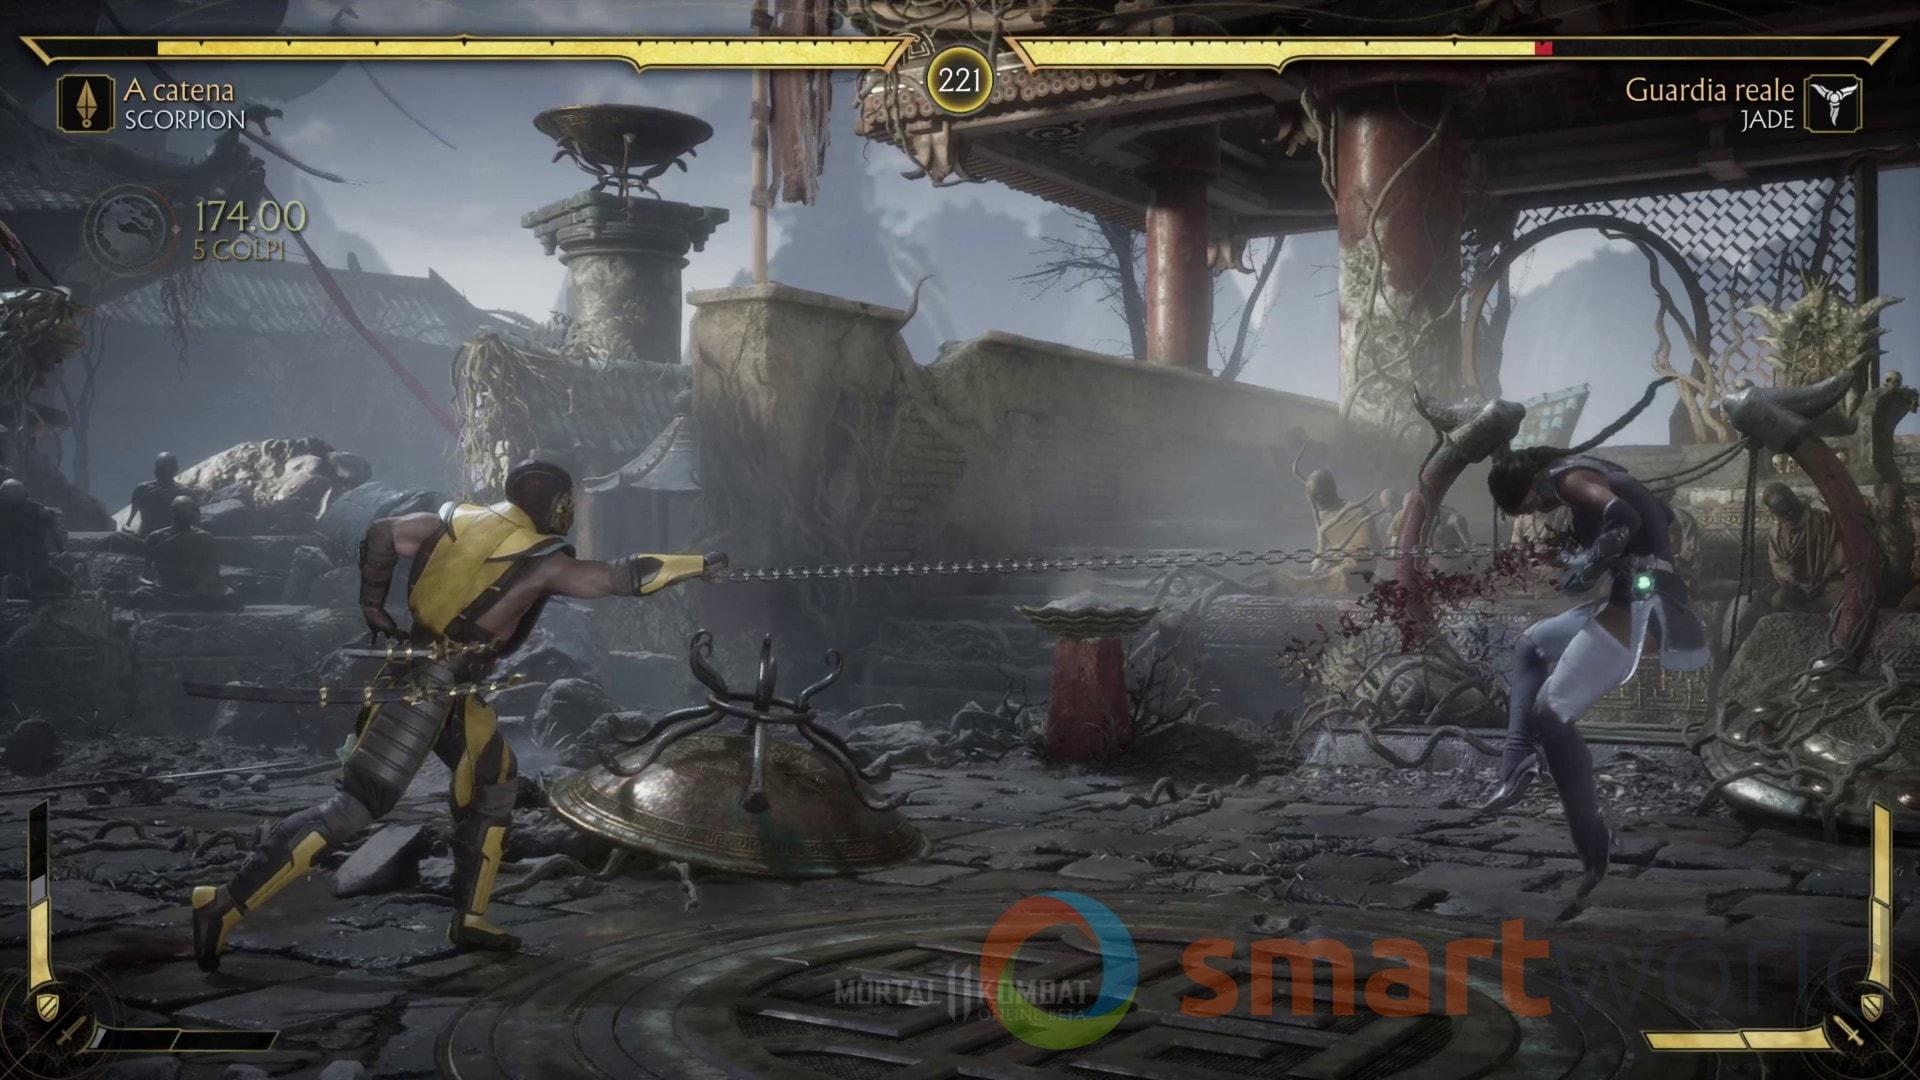 Mortal Kombat 11 Provato Anteprima 1